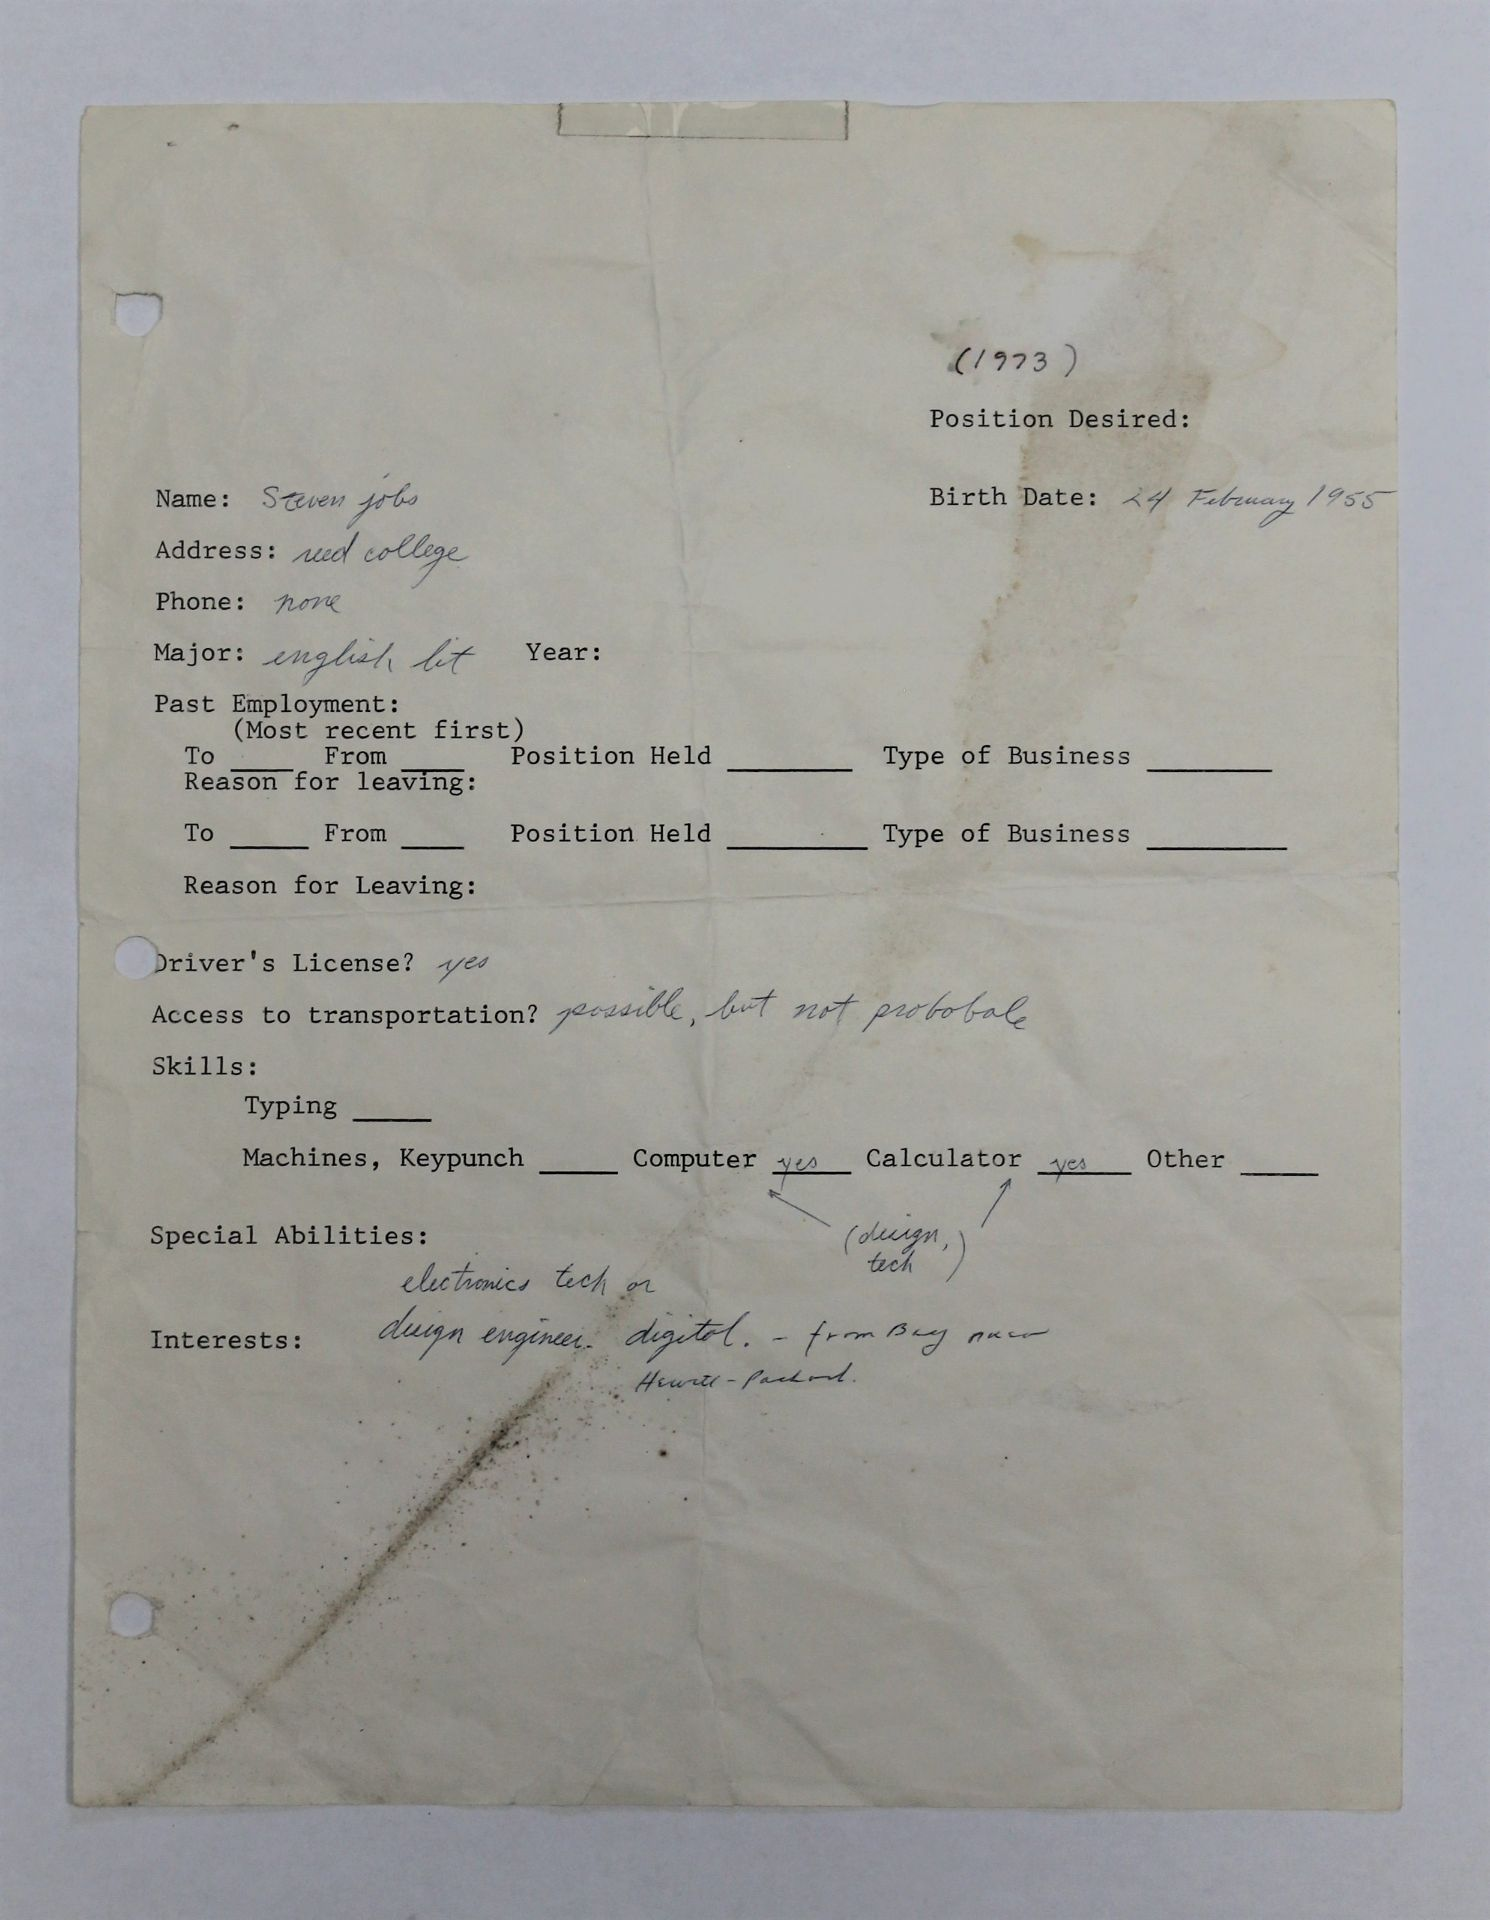 Steve Jobs 1973 Hand-Written and Signed Job Application